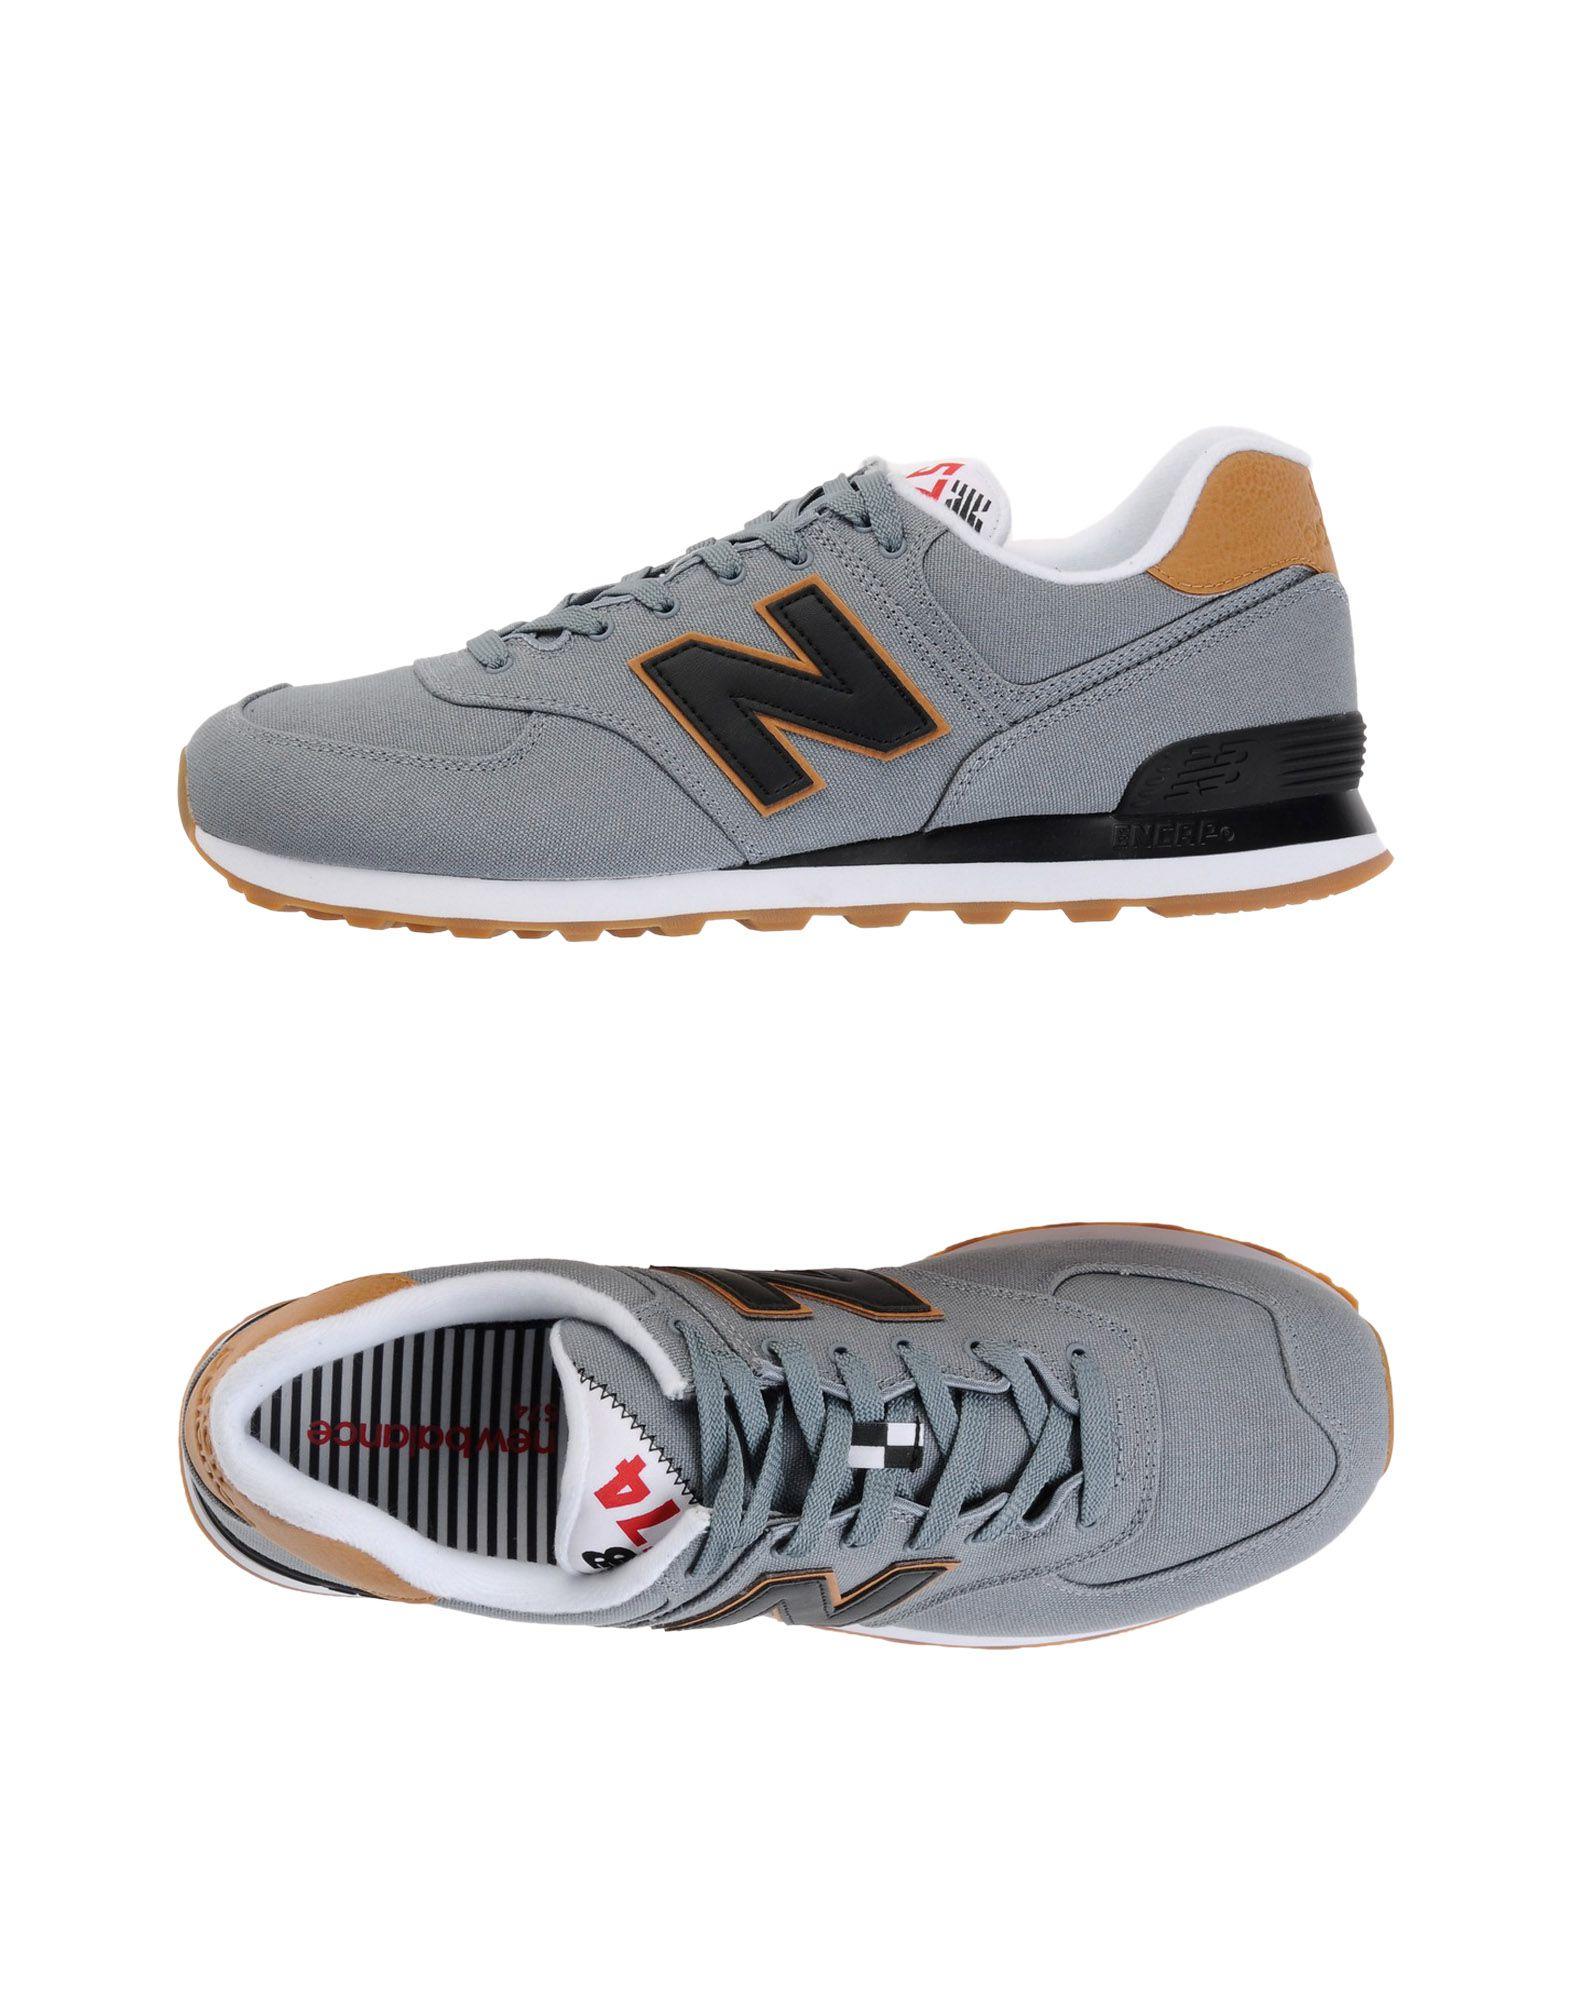 New Balance 574 Yacht Club - Sneakers